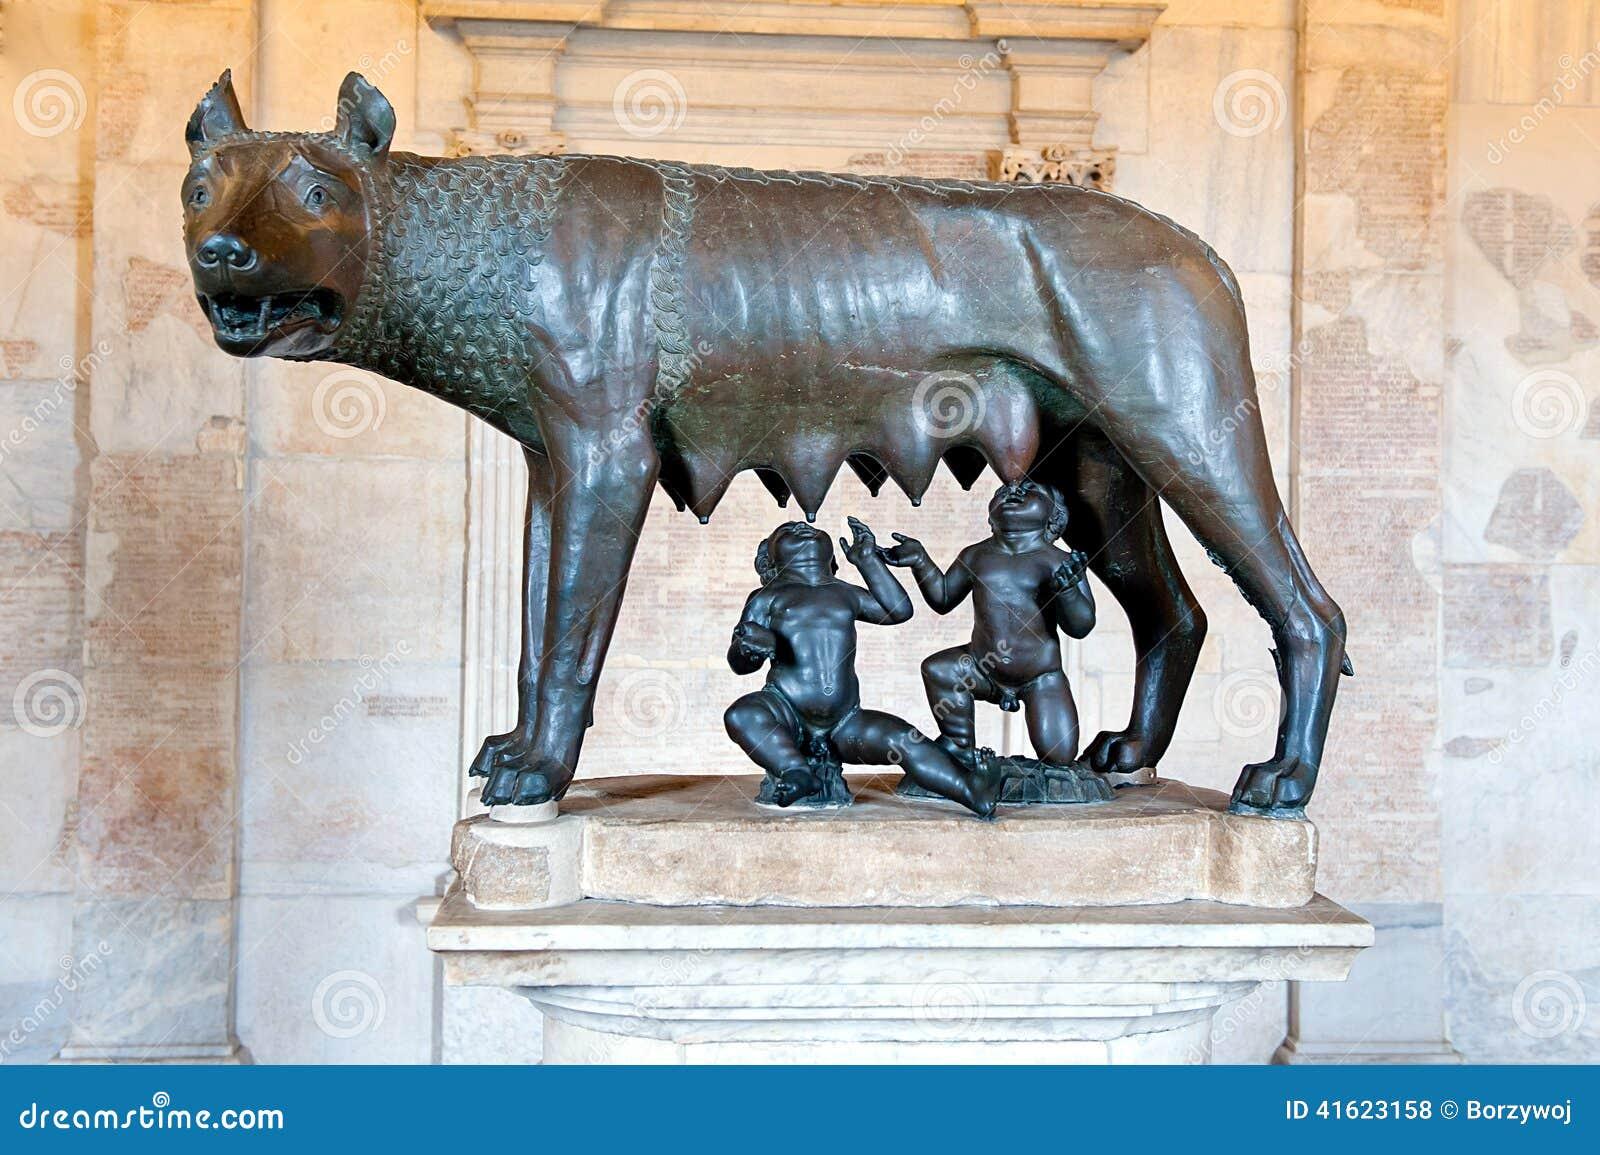 She wolf symbol of rome stock photo image of italian 41623158 she wolf symbol of rome biocorpaavc